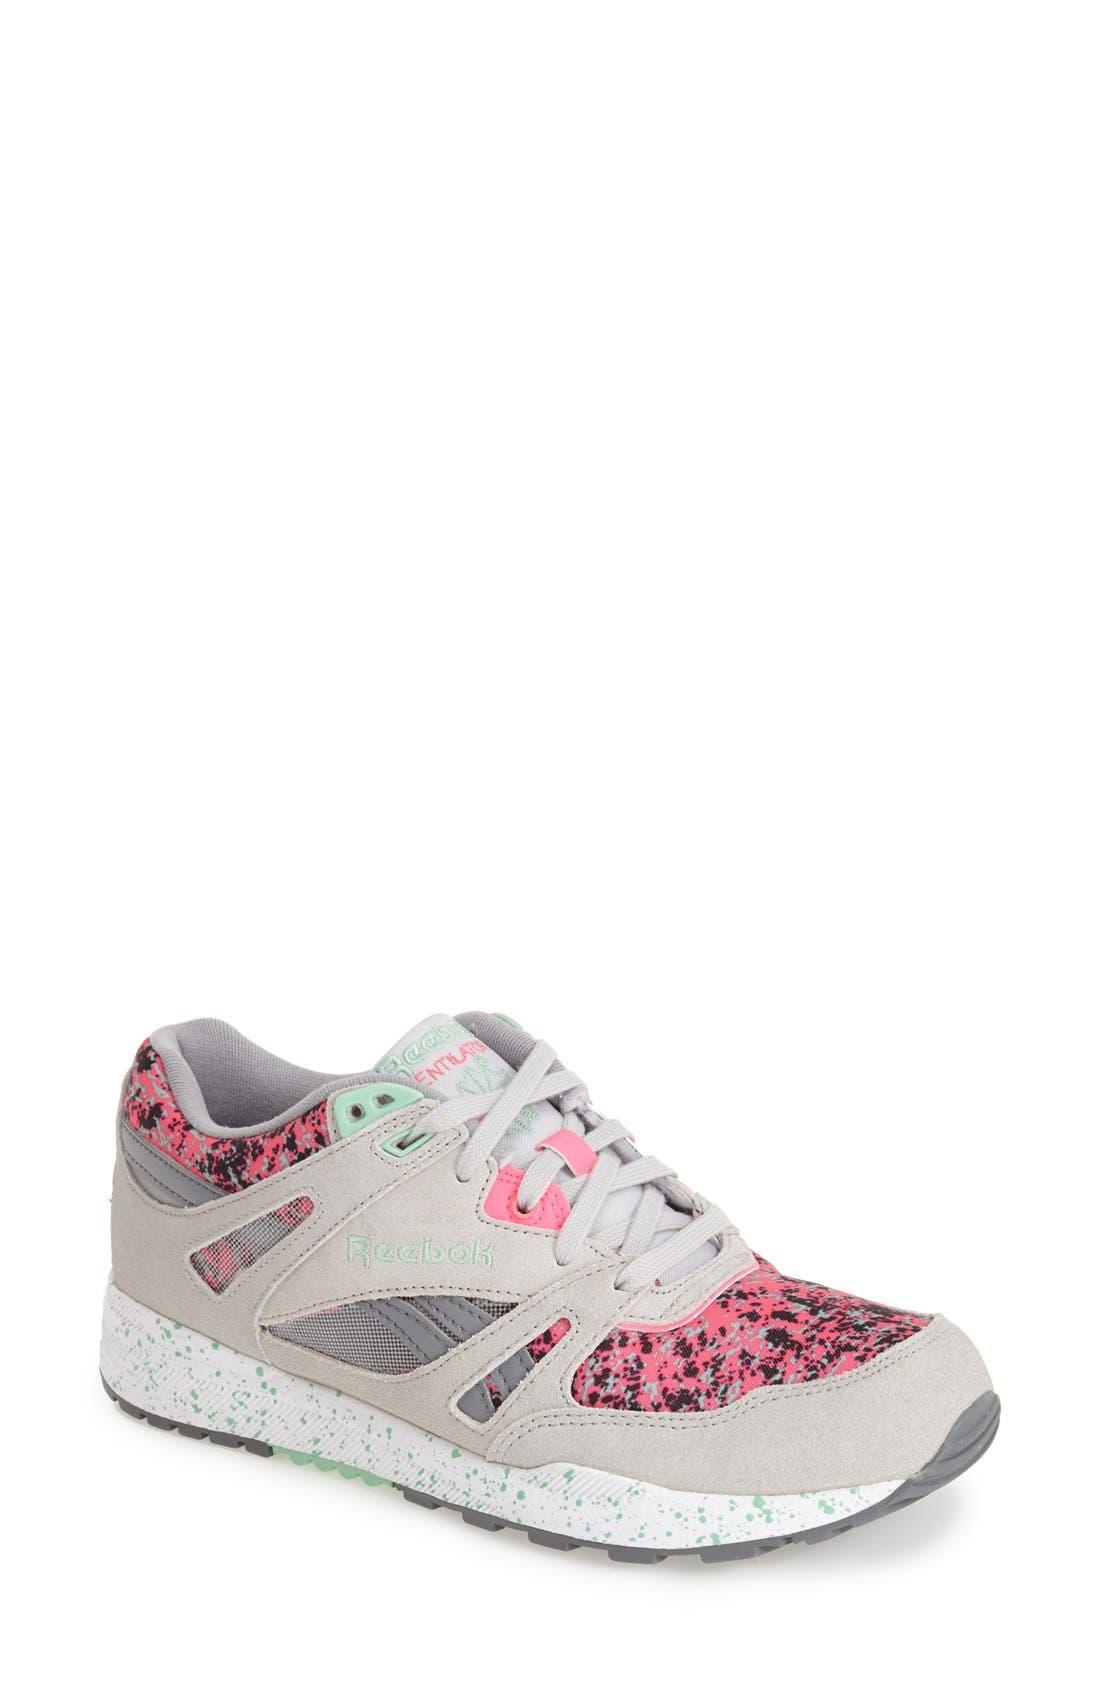 Main Image - Reebok 'Ventilator CC' Sneaker (Women)